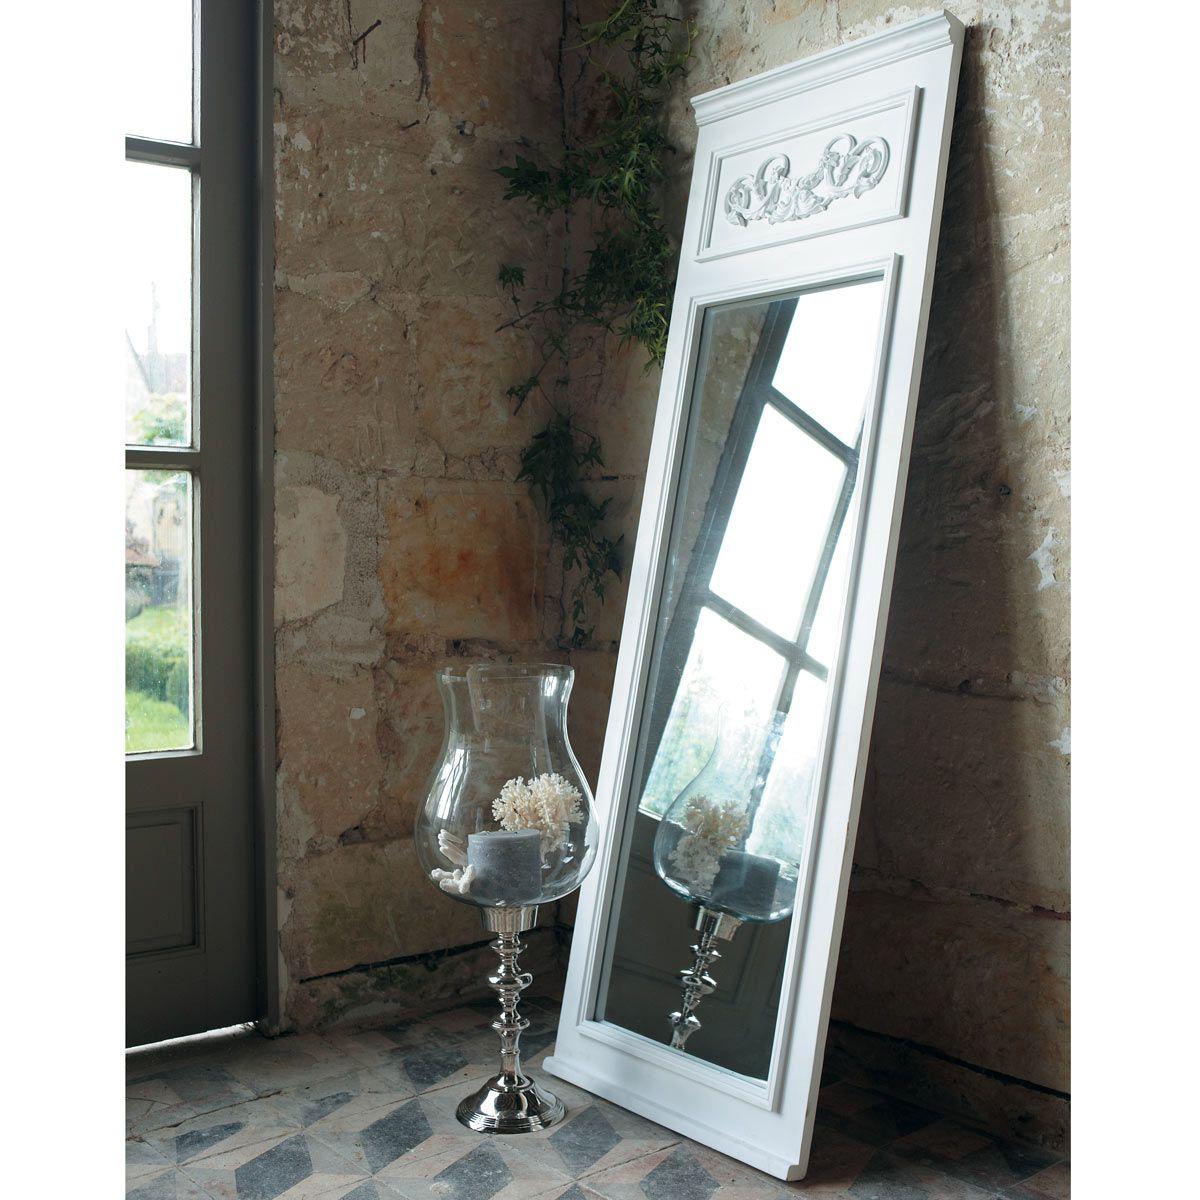 Miroir trumeau en sapin blanc H 170 cm | Pinterest | Spiegel und ...